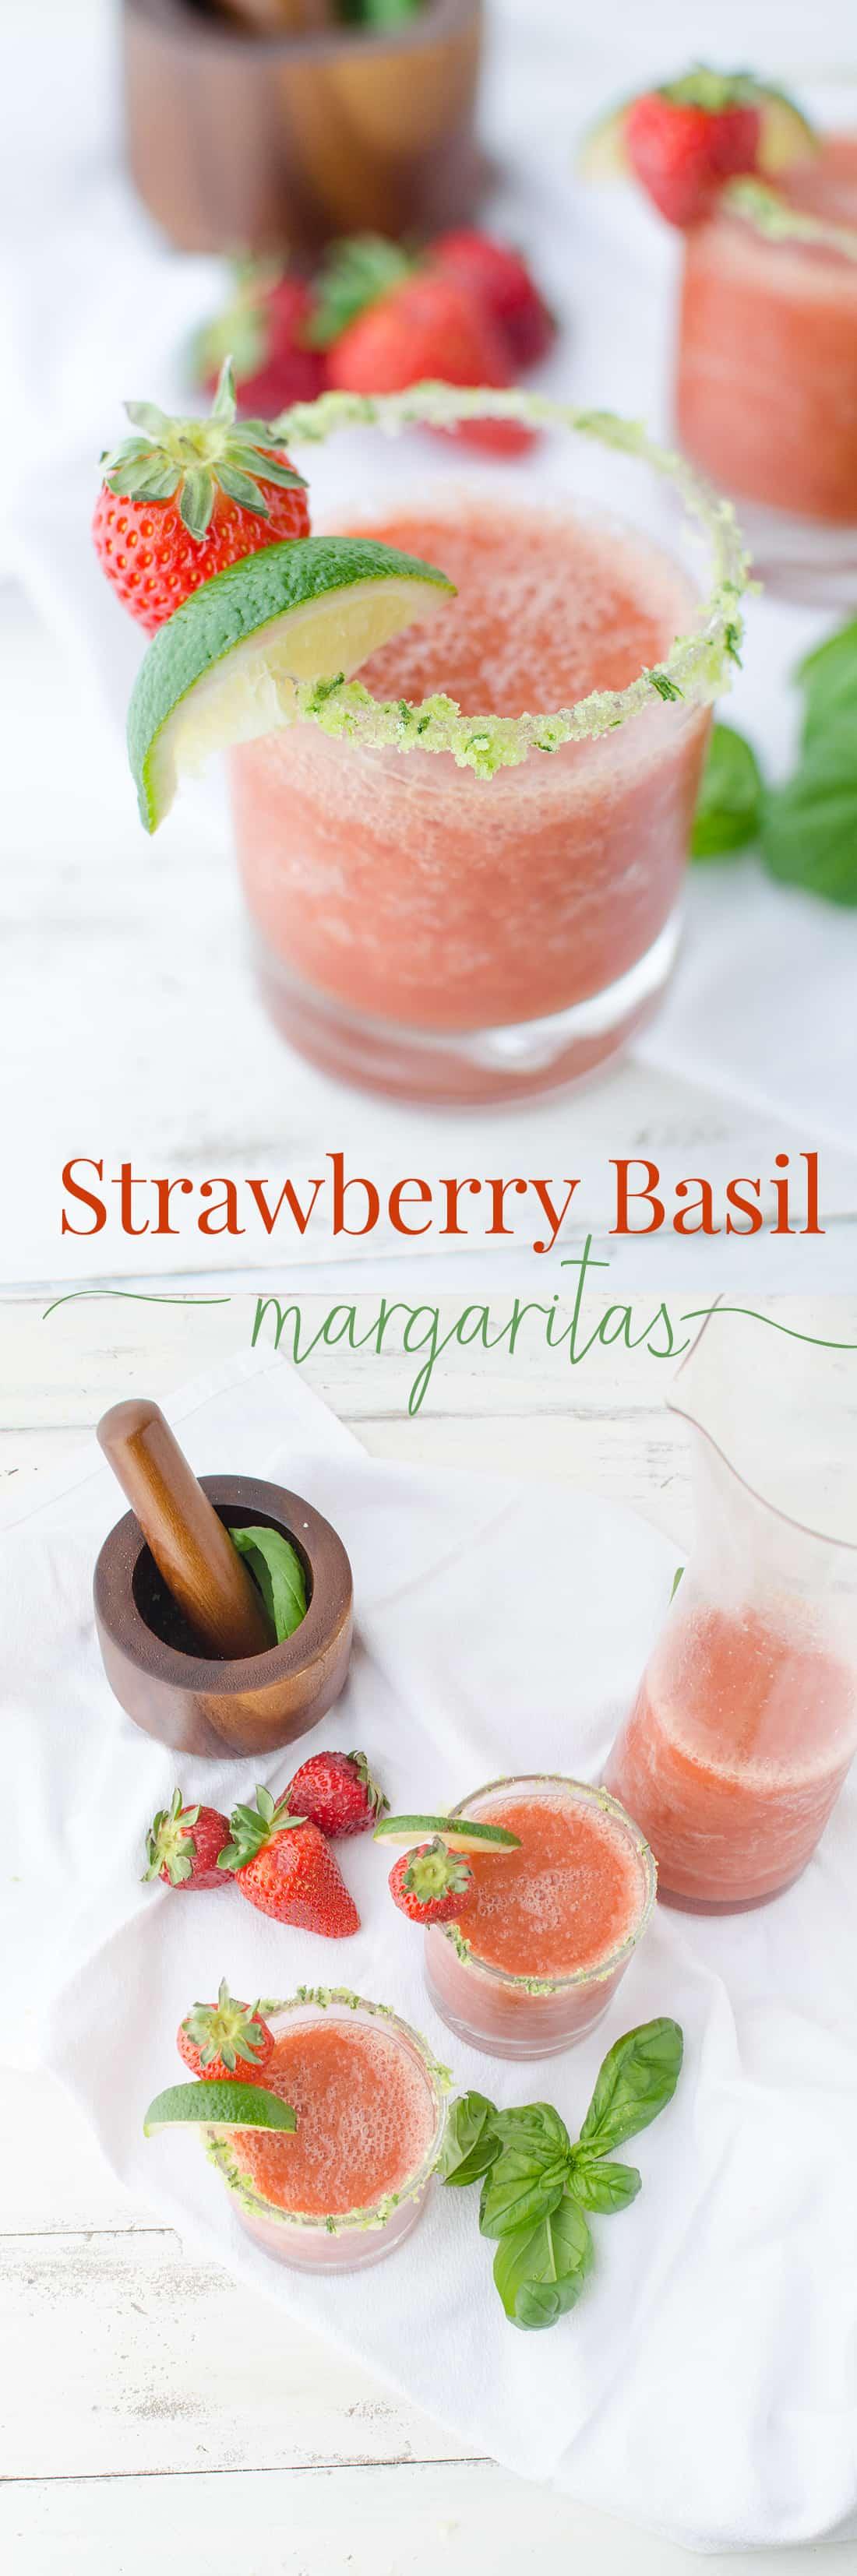 Frozen Strawberry Basil Margaritas with Basil-Salt rim